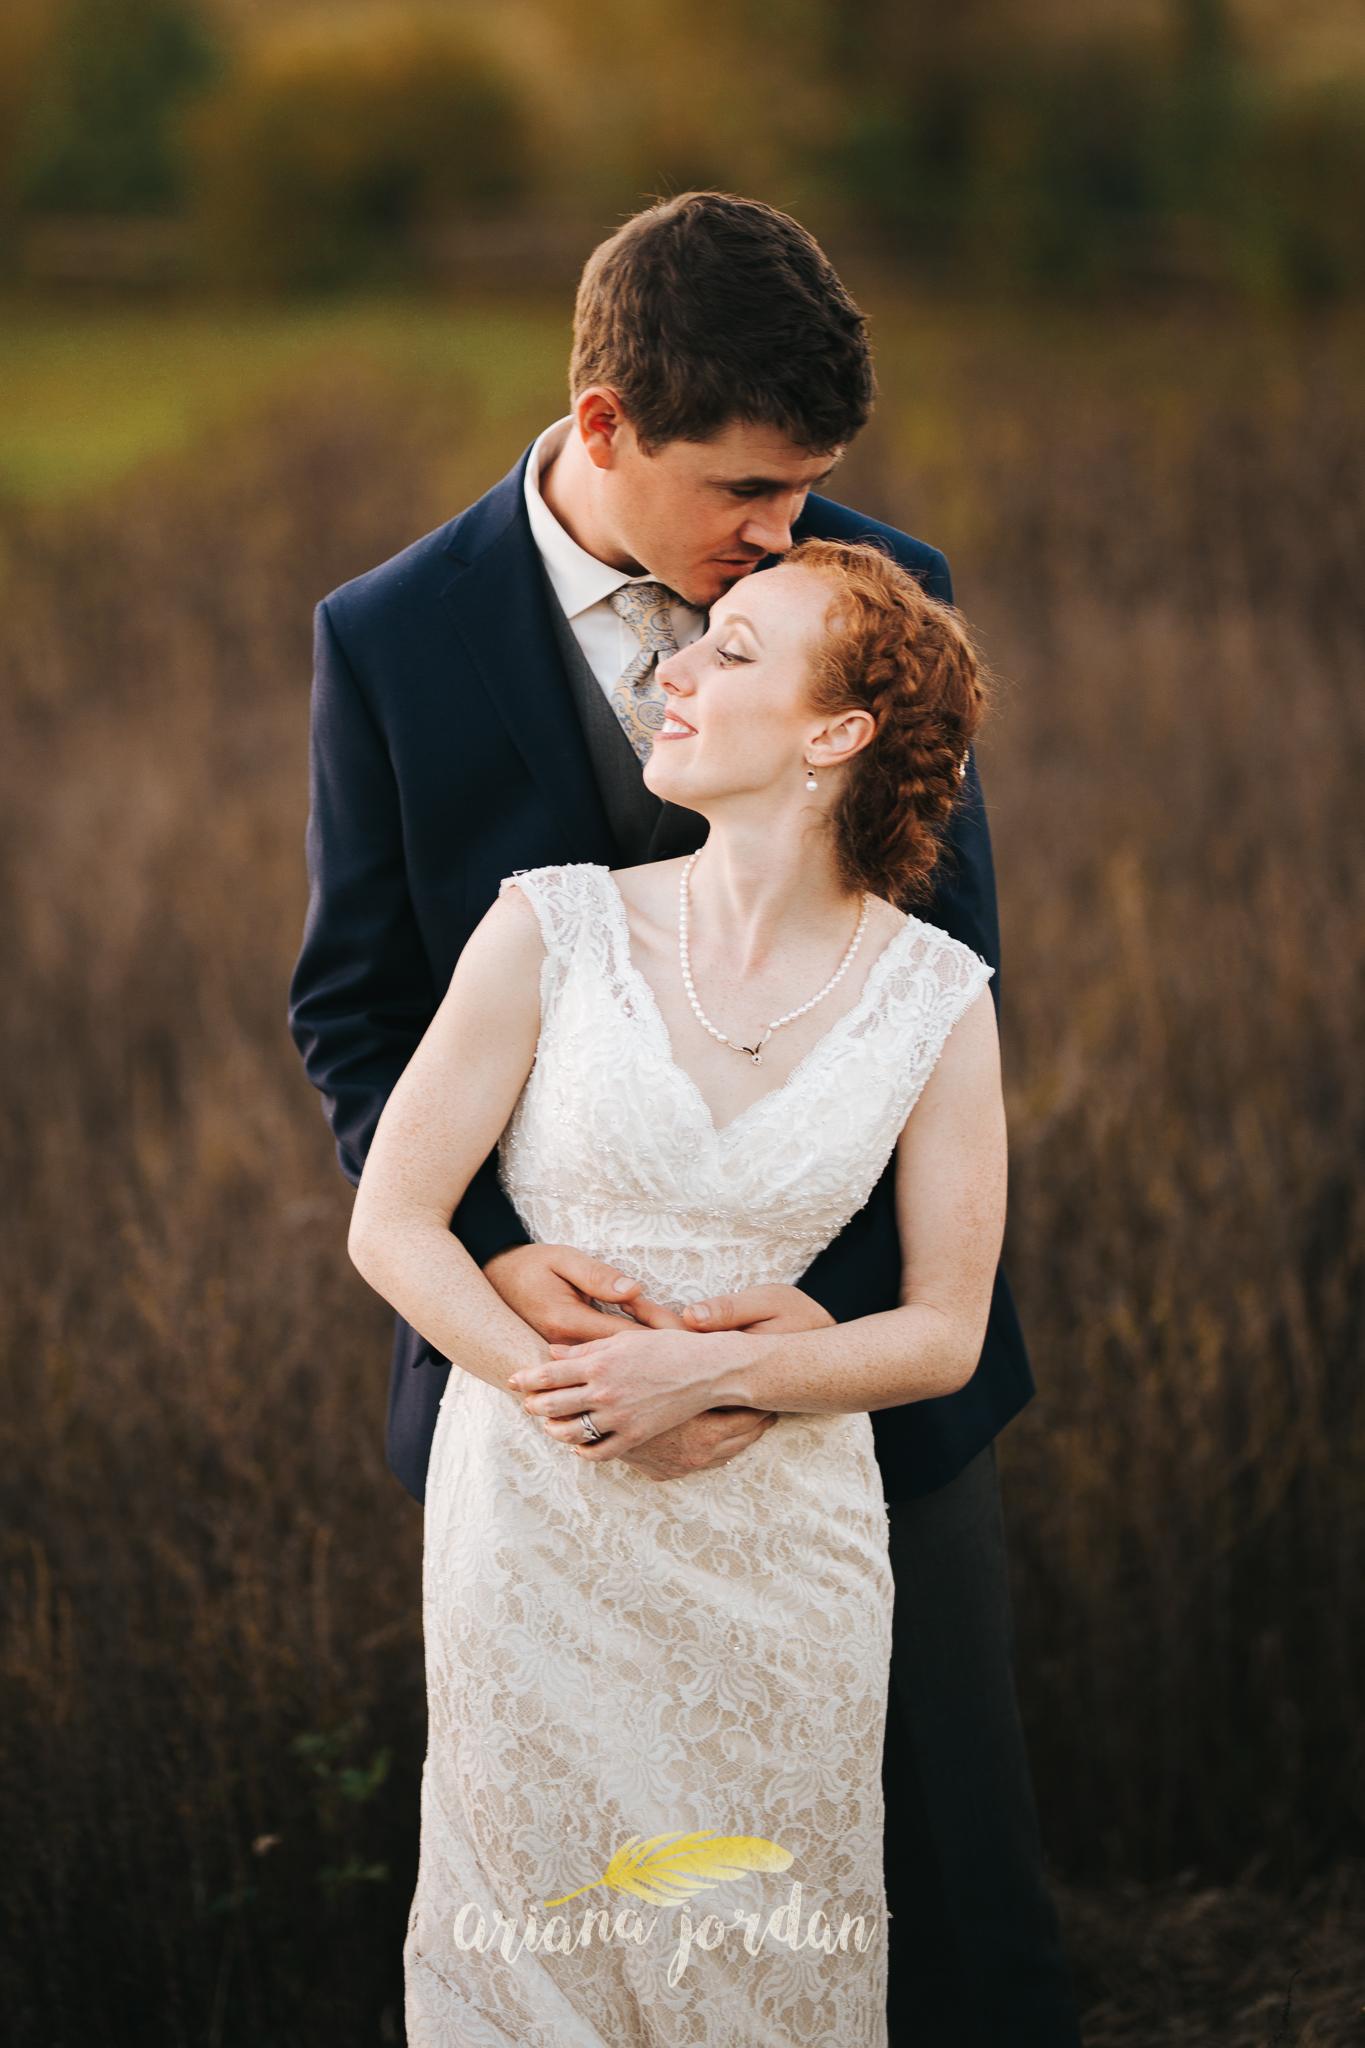 136 Ariana Jordan Photography -Moonlight Fields Lexington Ky Wedding Photographer 5155.jpg